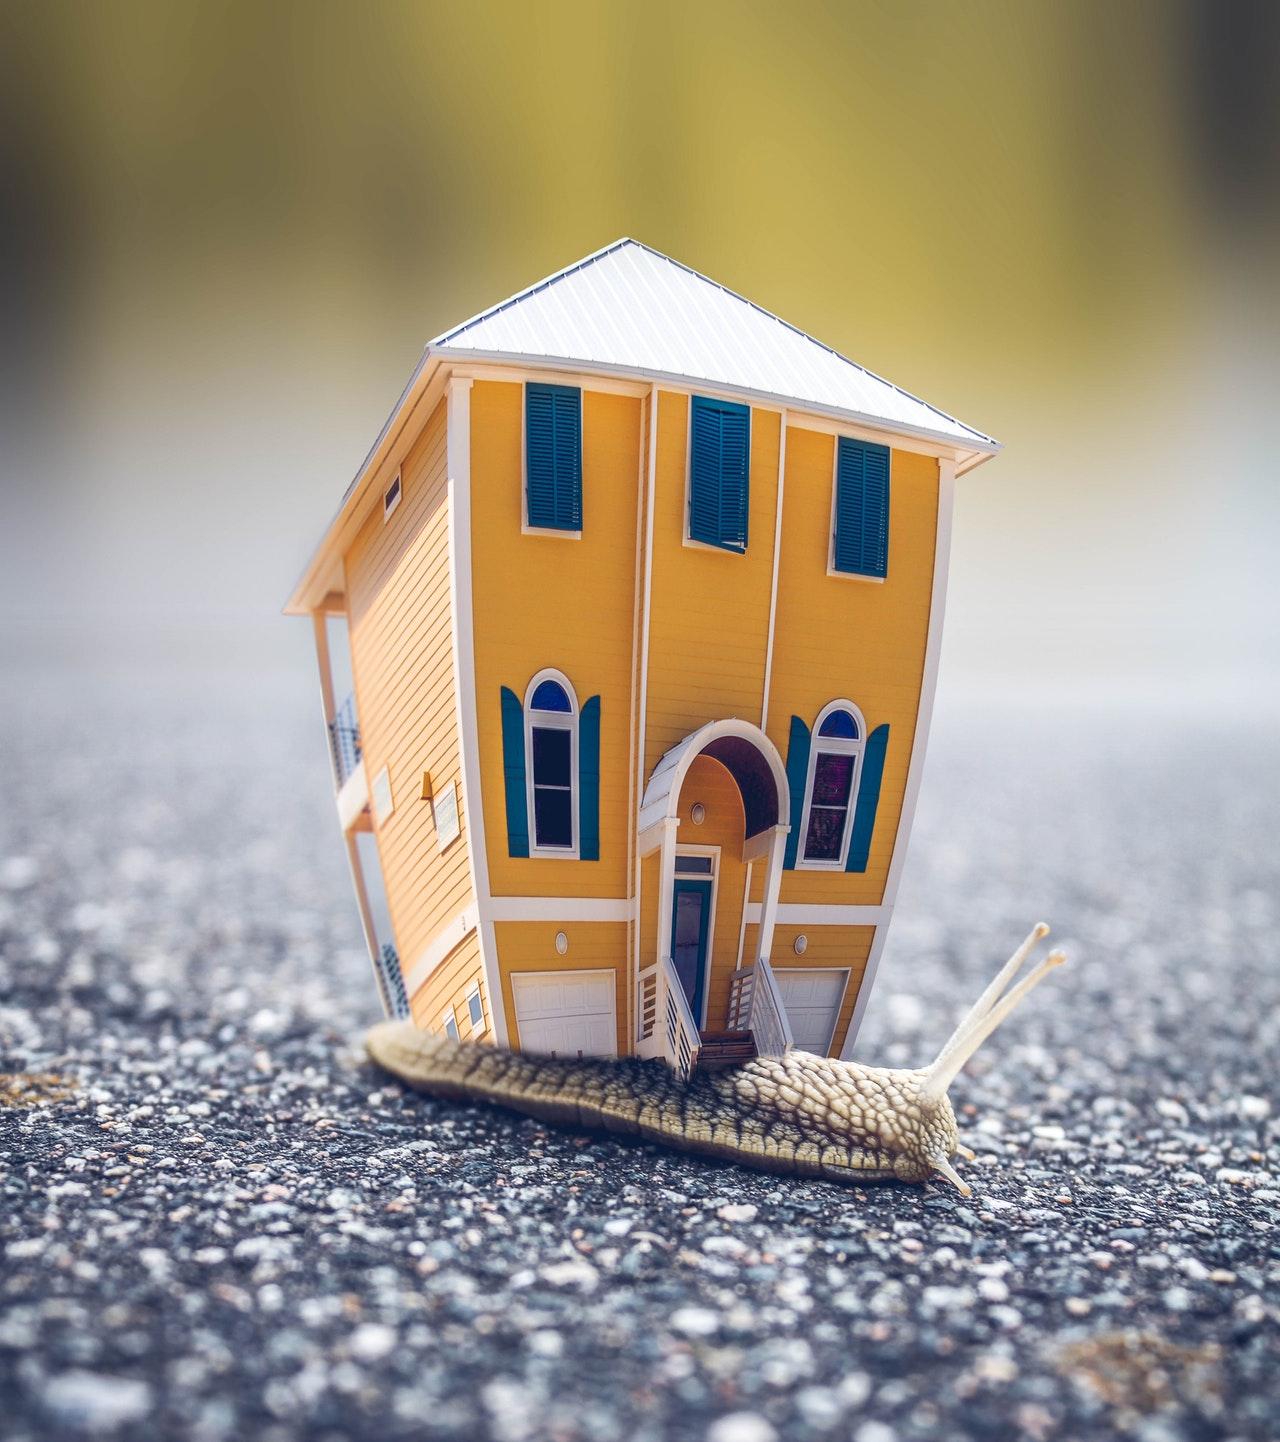 jak zjistit majitele nemovitosti